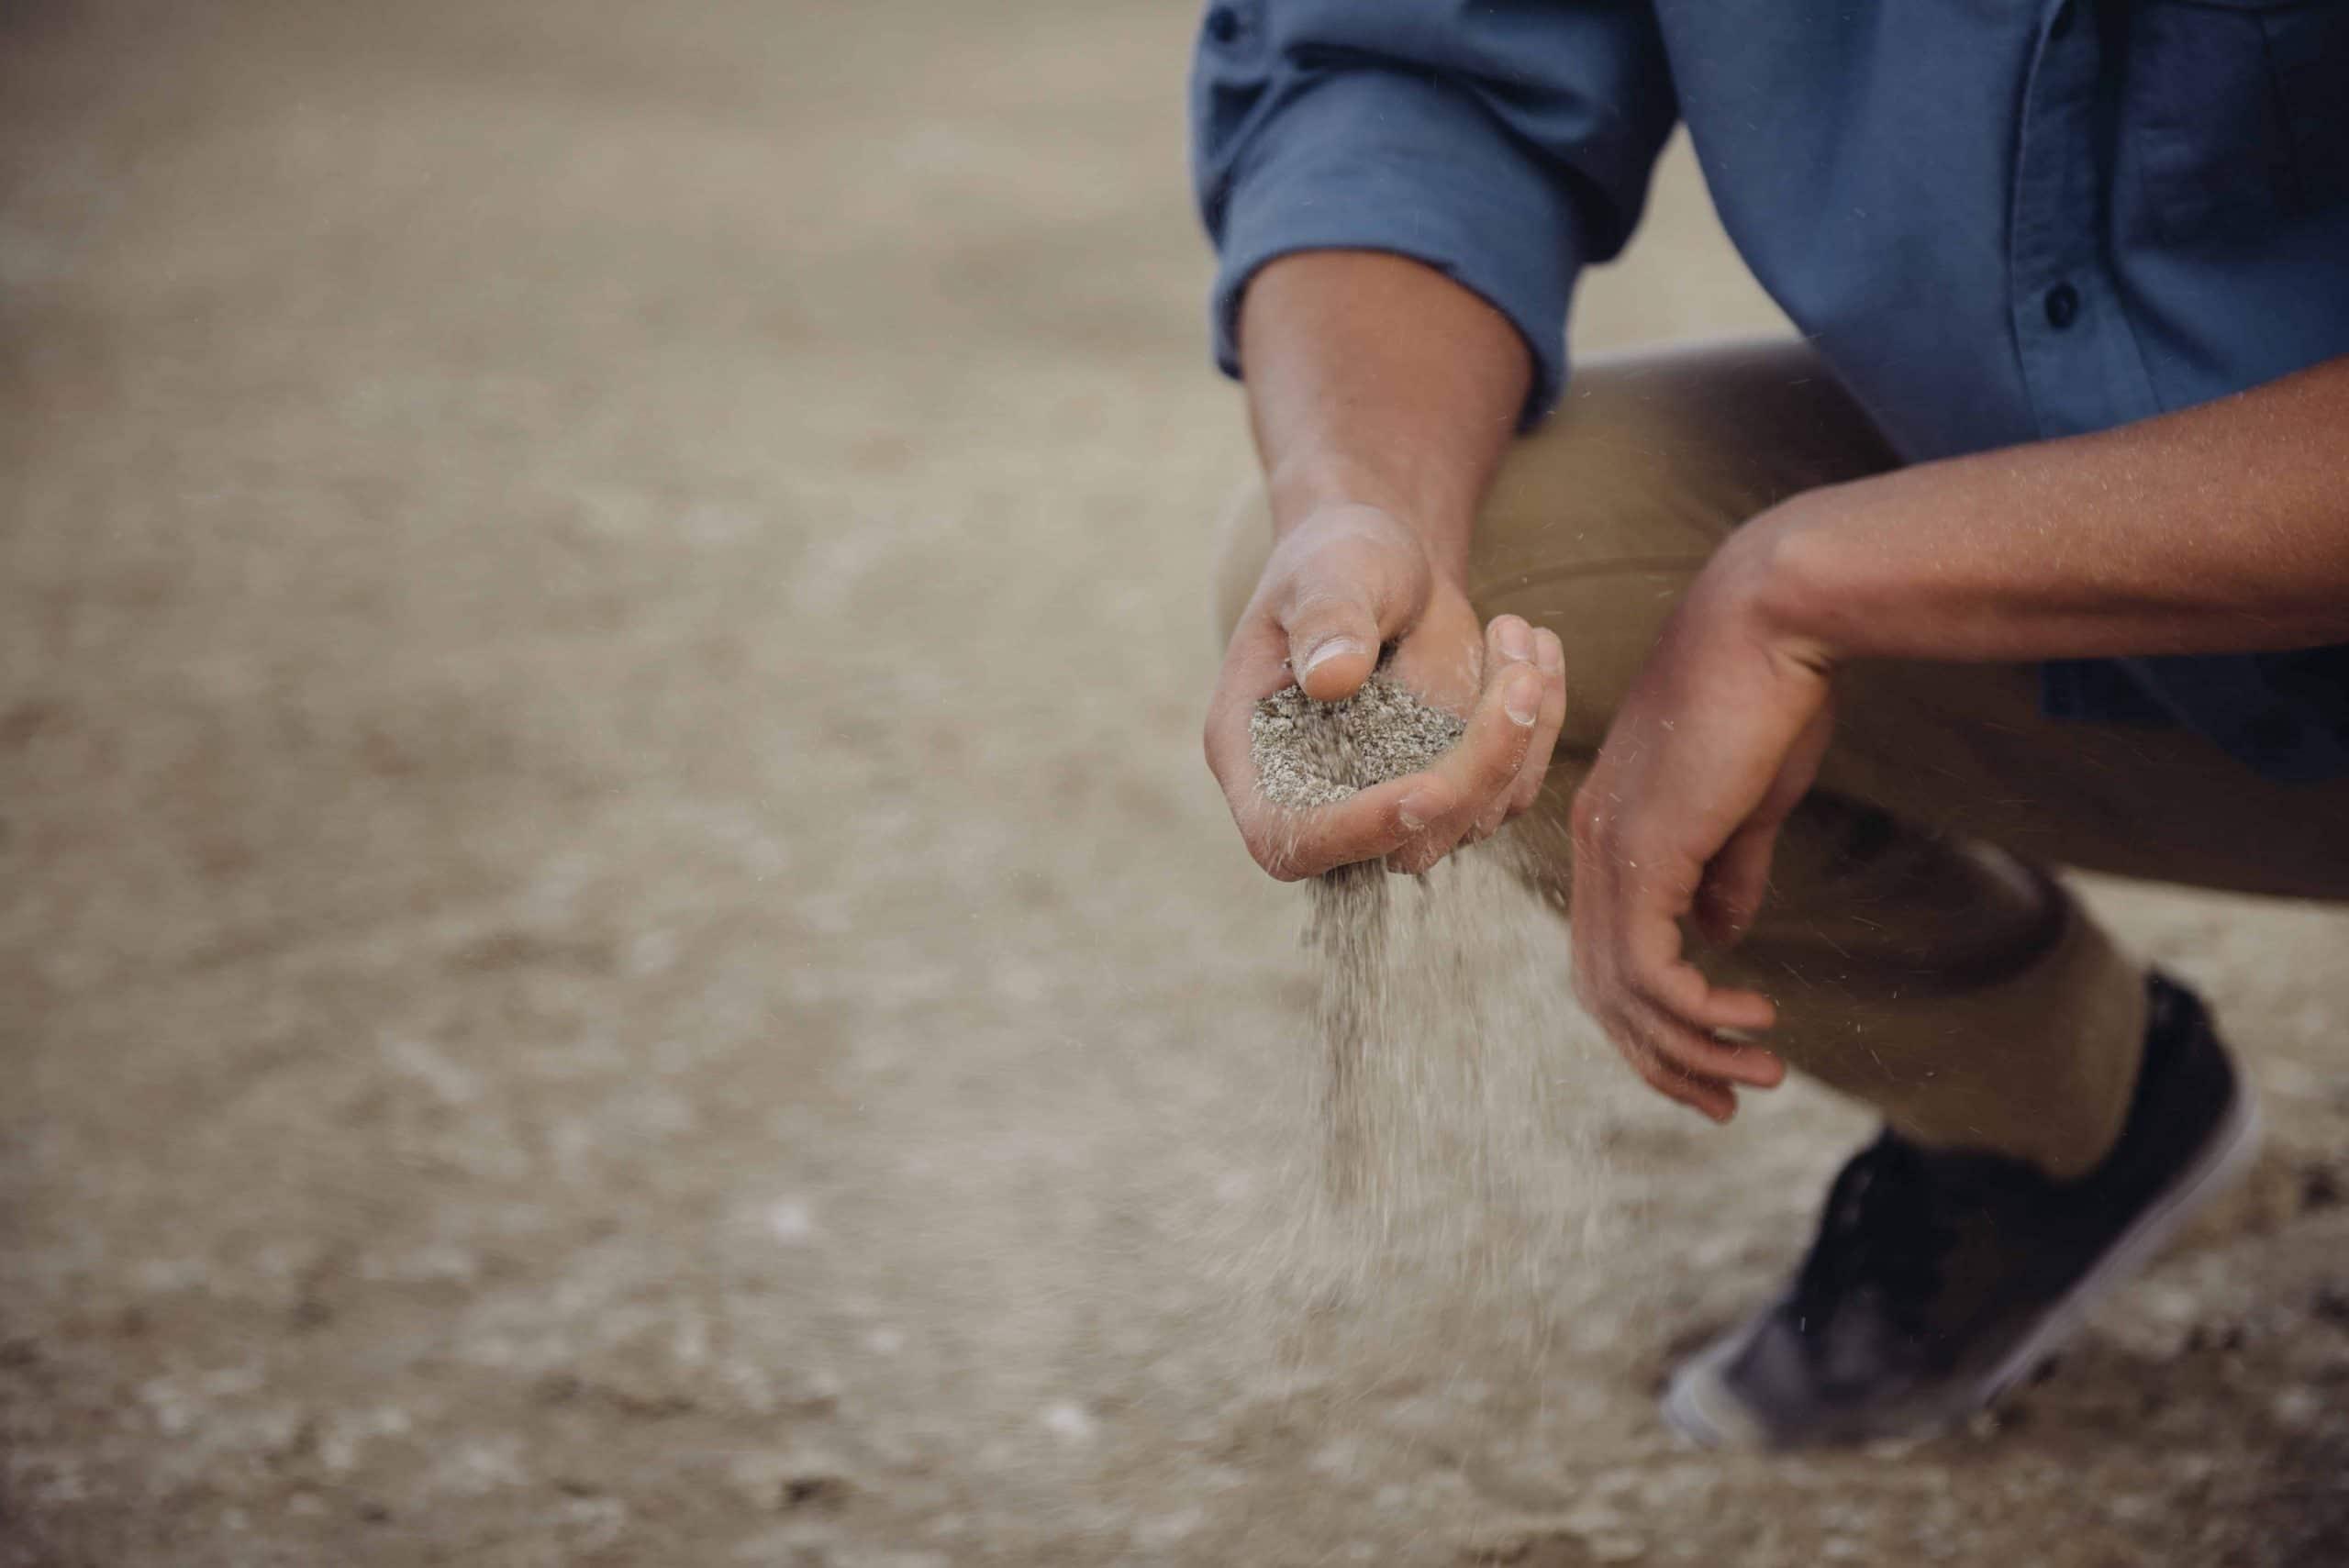 Soil-Post-Image